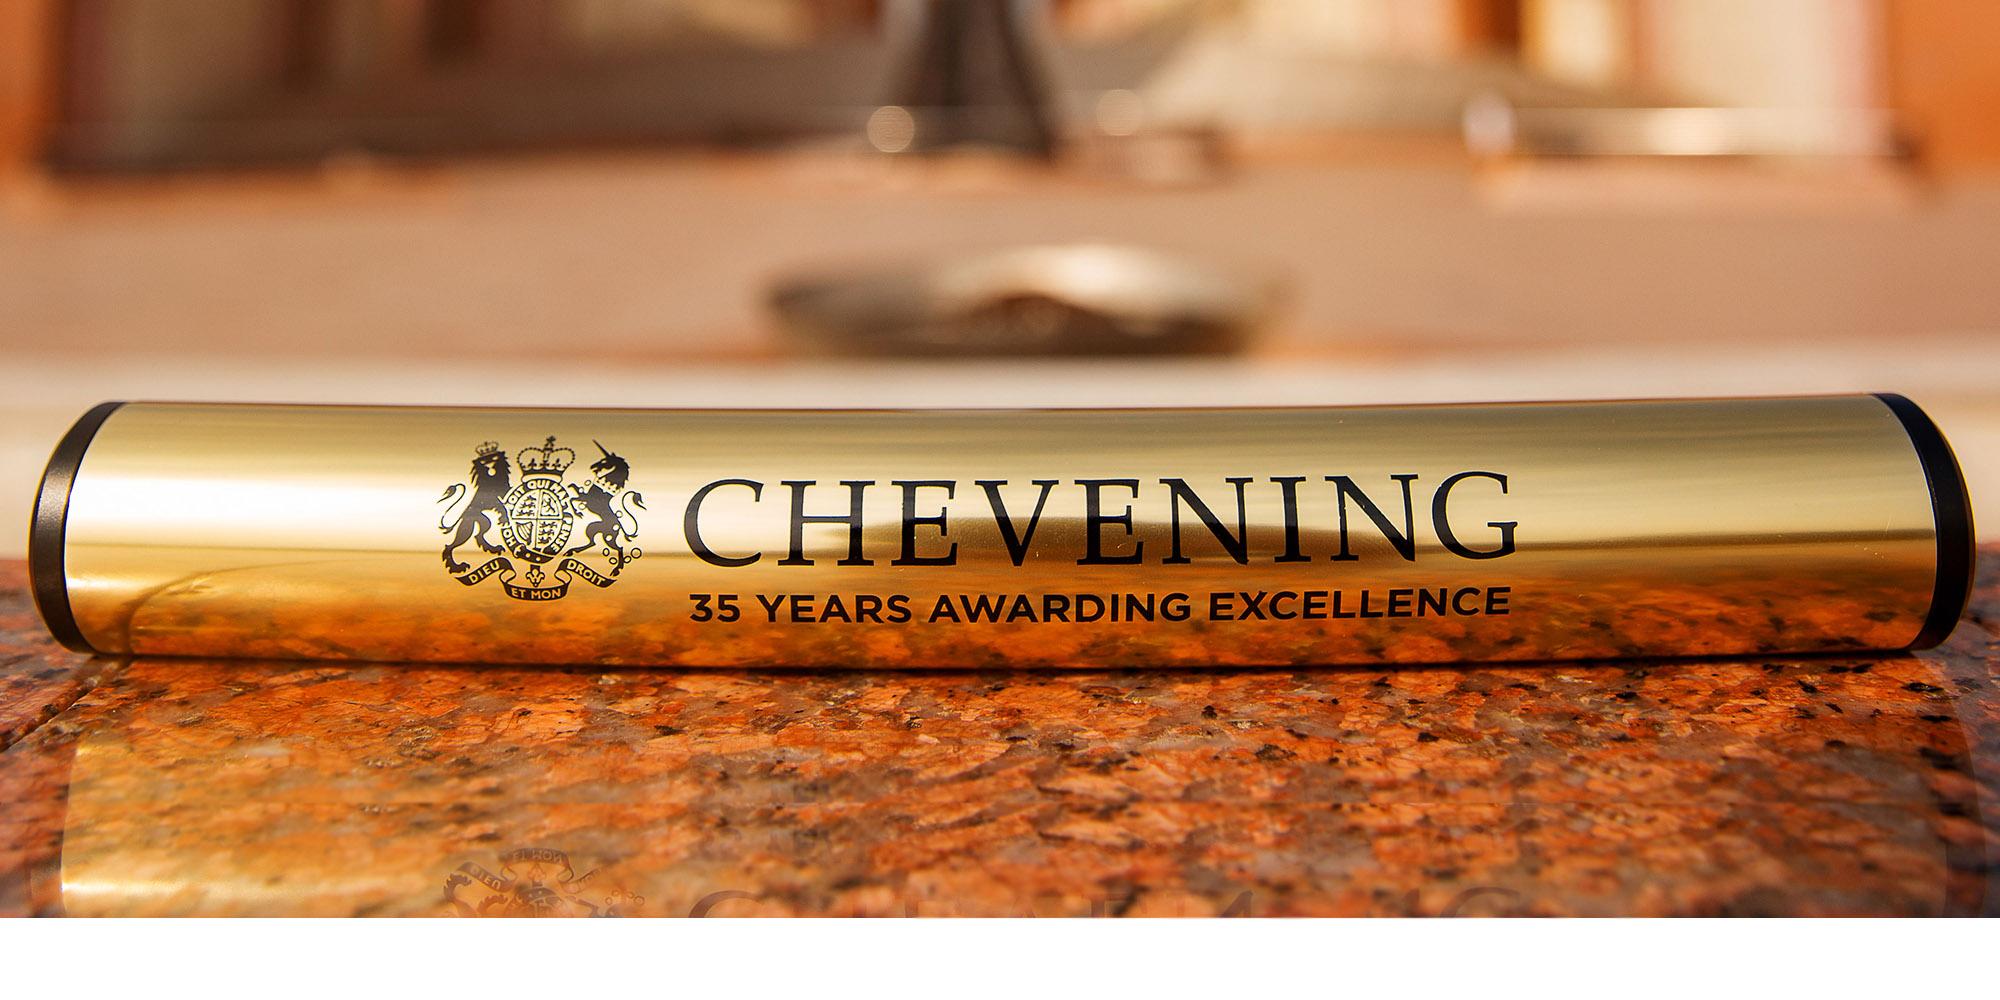 Chevening Baton